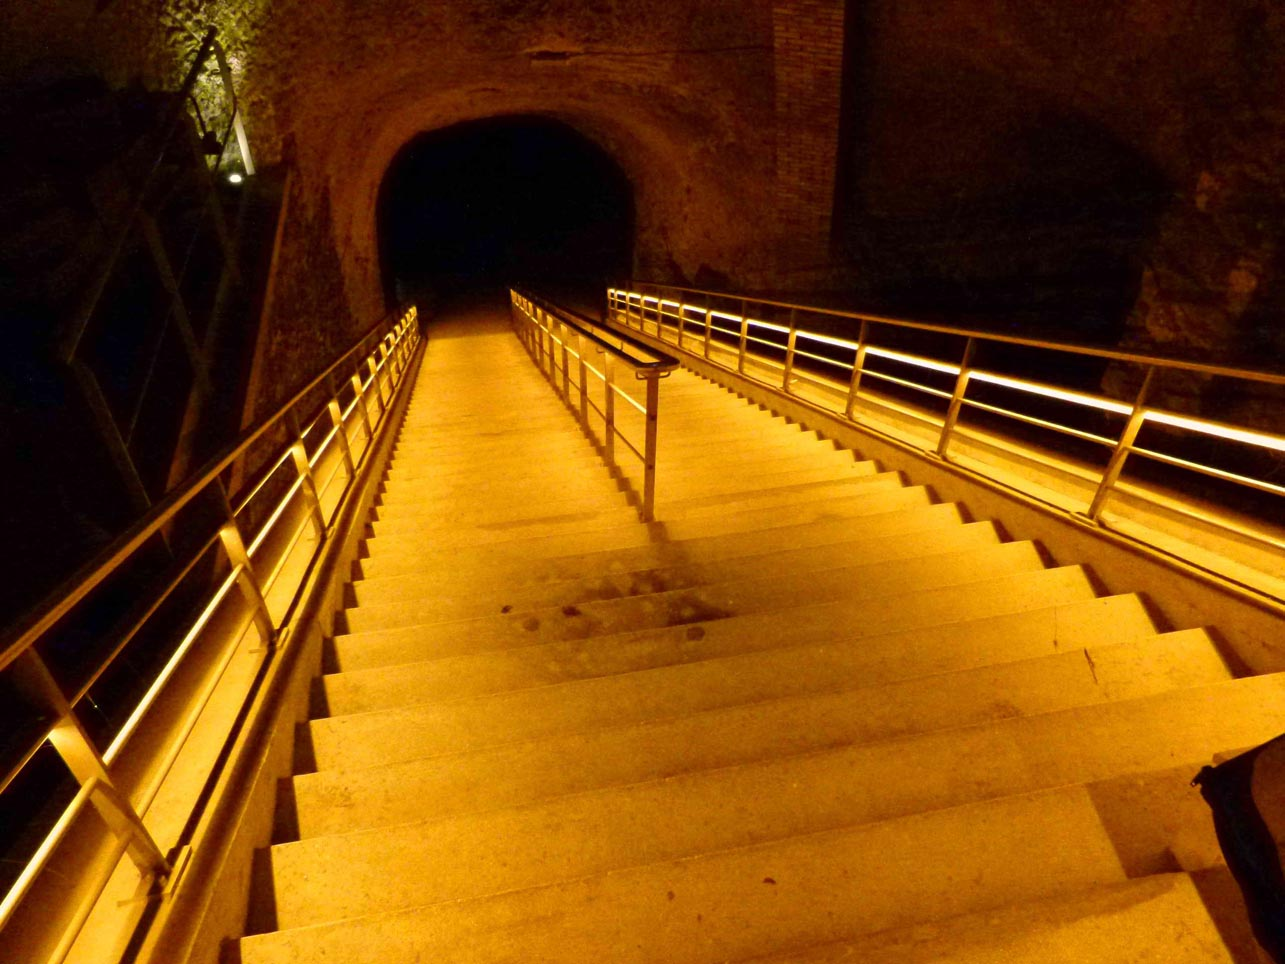 vineo-neolux-led-lighting-solutions-veuve-clicquot-4